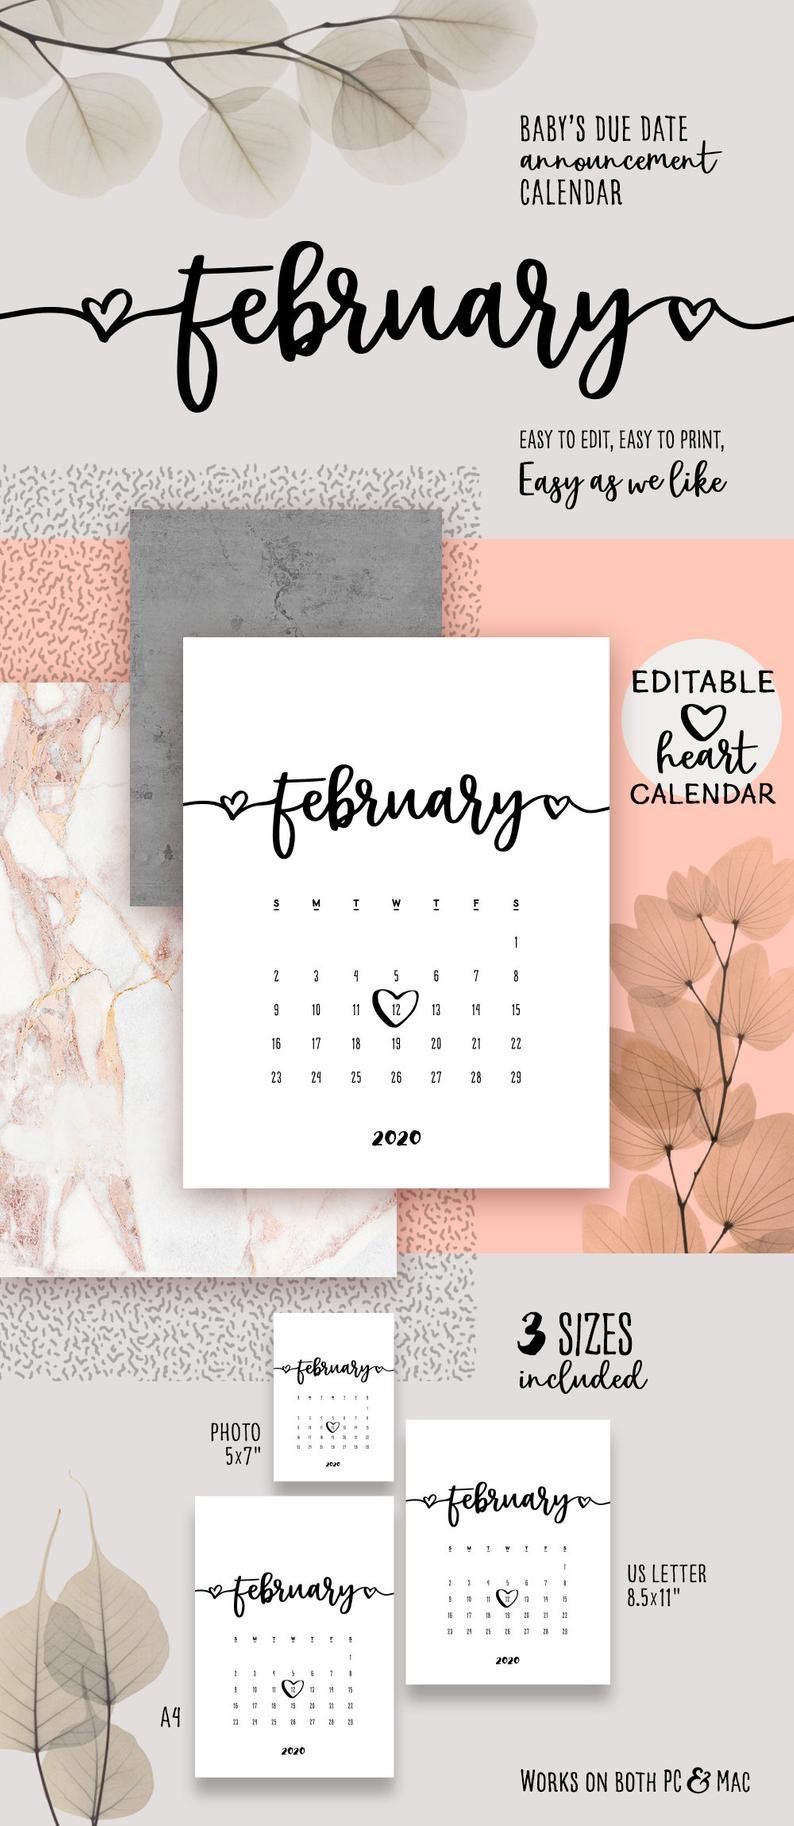 February 2020 Printable Pregnancy Calendar Lovely Baby Due Date  Announcement Calendar Pdf Reveal Baby Announce Birthday Printable Calendar